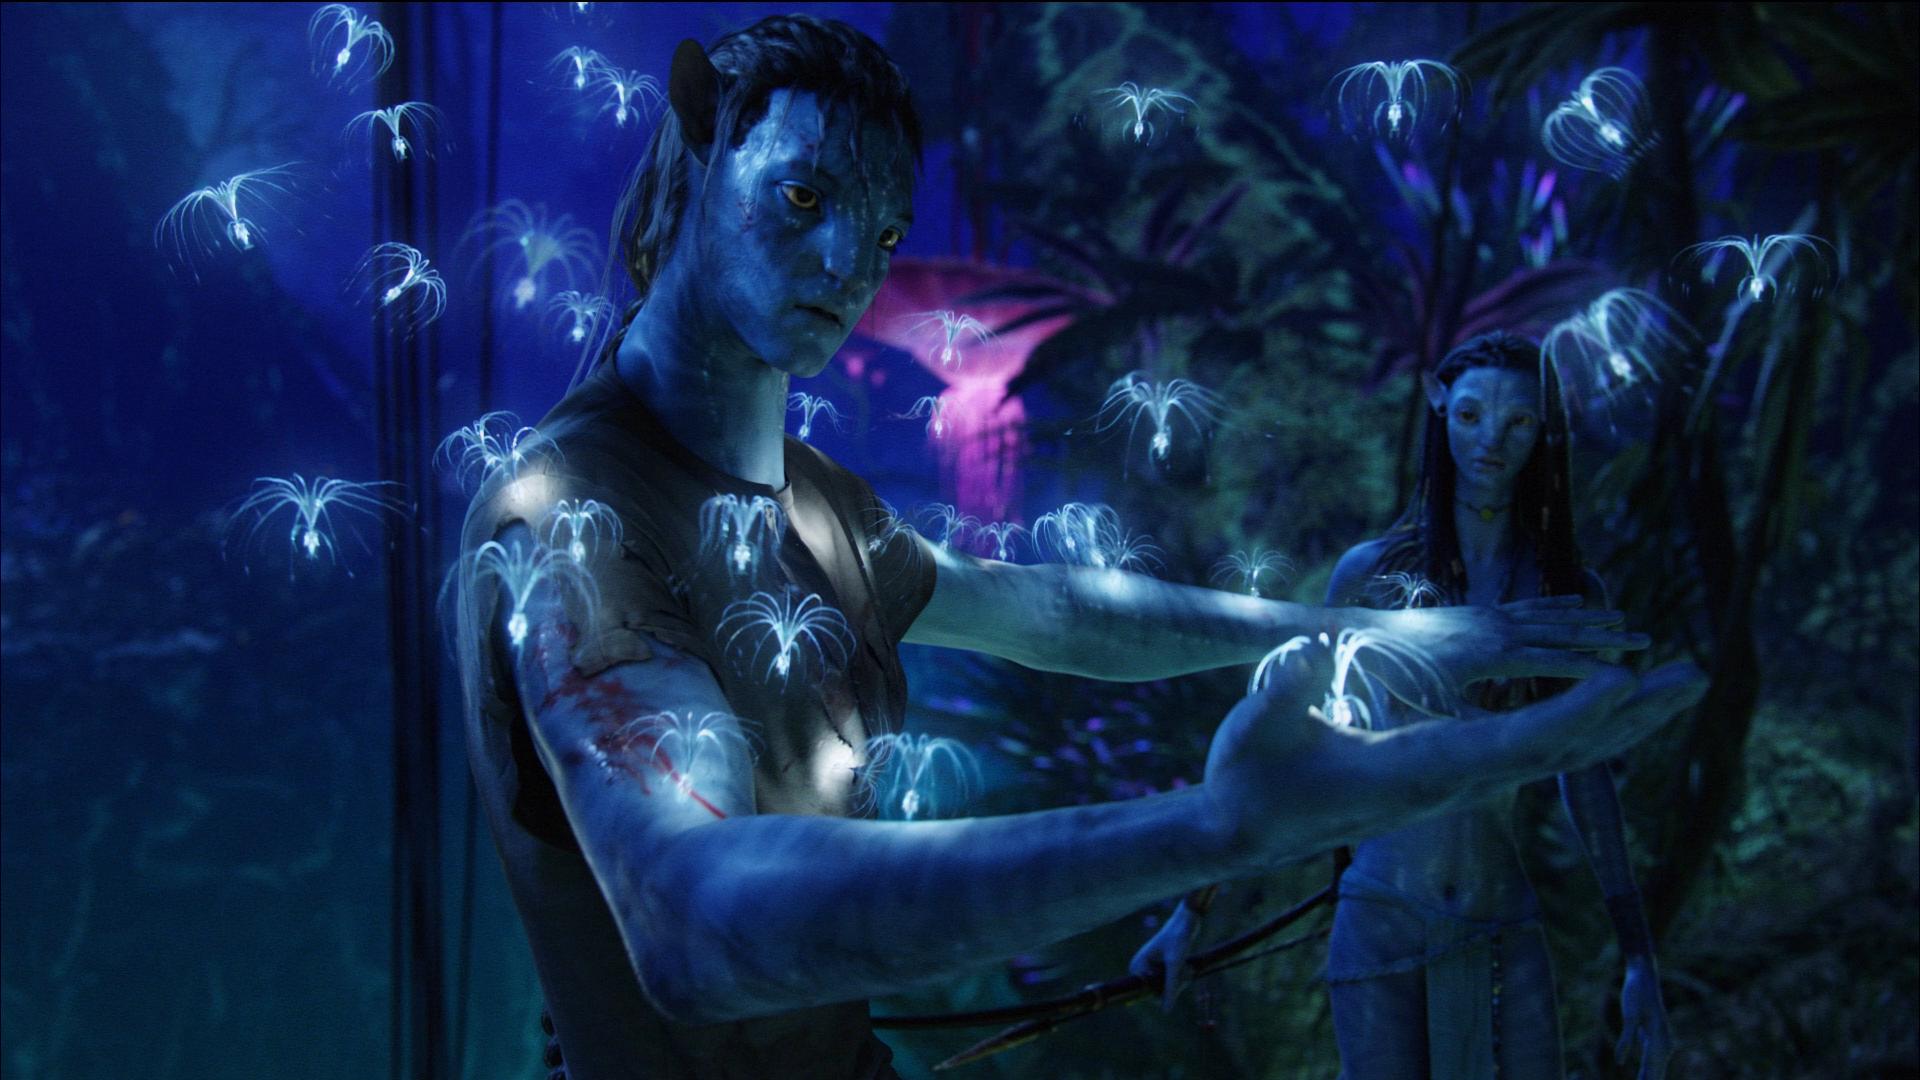 Original Avatar HD Wallpapers for All Avatar Wallpaper Fans | Leawo ...: www.leawo.com/blog/2010/08/original-avatar-hd-wallpapers-for-all...